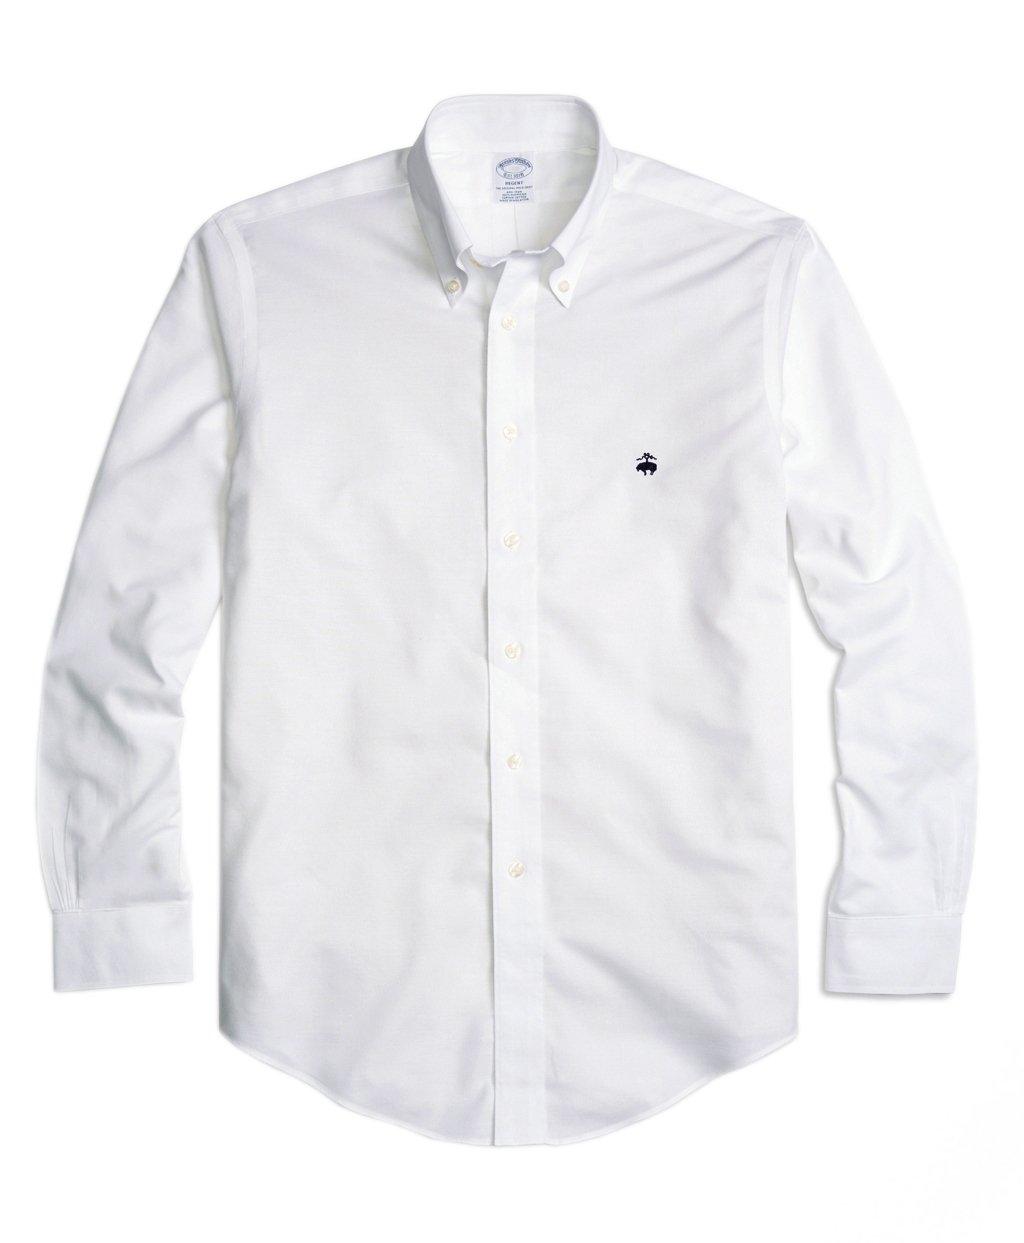 4c3b76e241f Amazon.com  Brooks Brothers Men s Regent Slim Fit Non Iron Oxford Button  Down Shirt White (X-Large)  Home   Kitchen